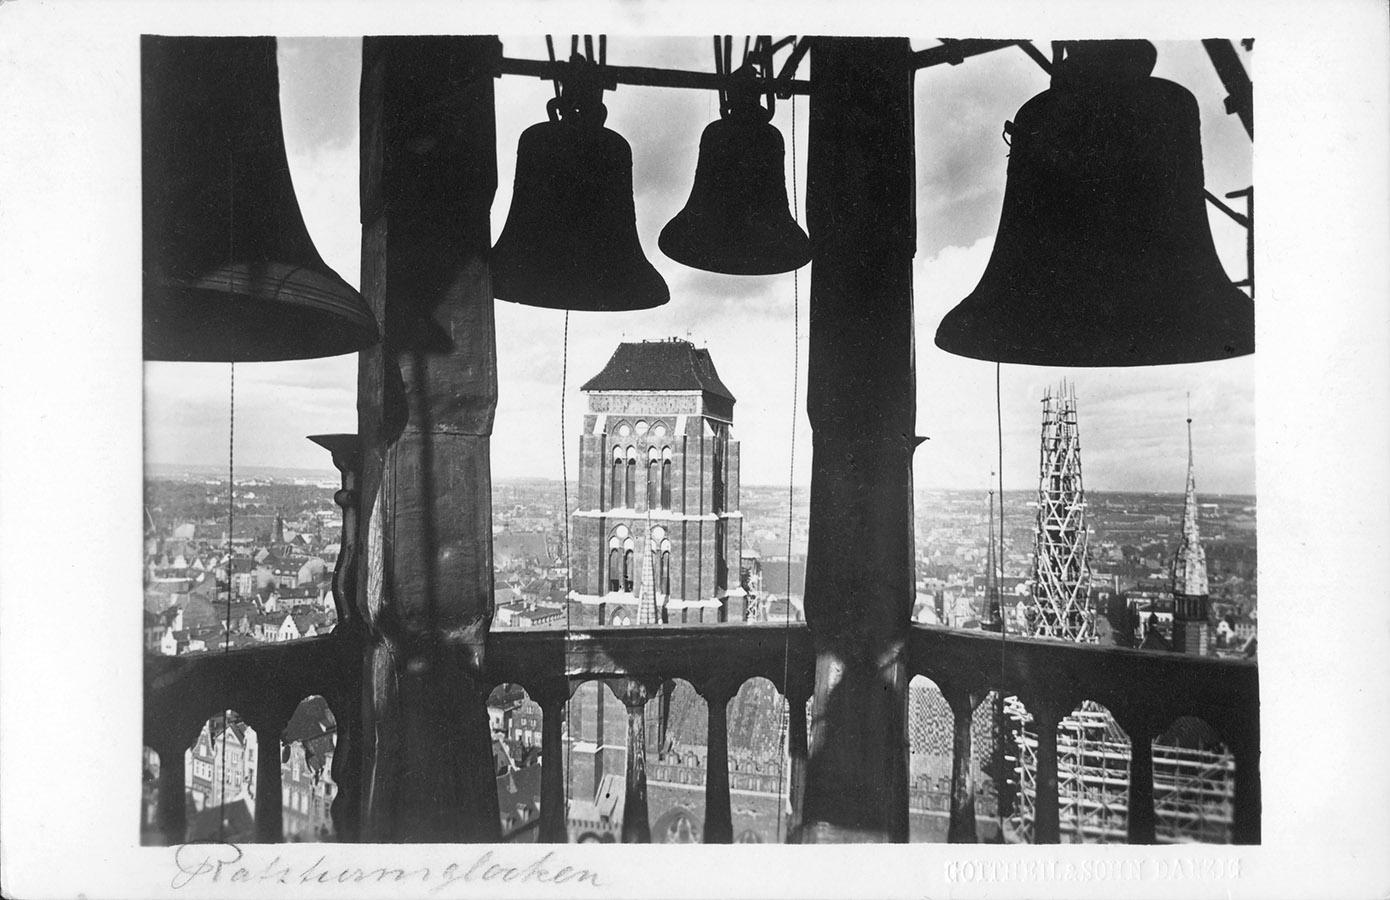 12-Gottheil_carillon_1